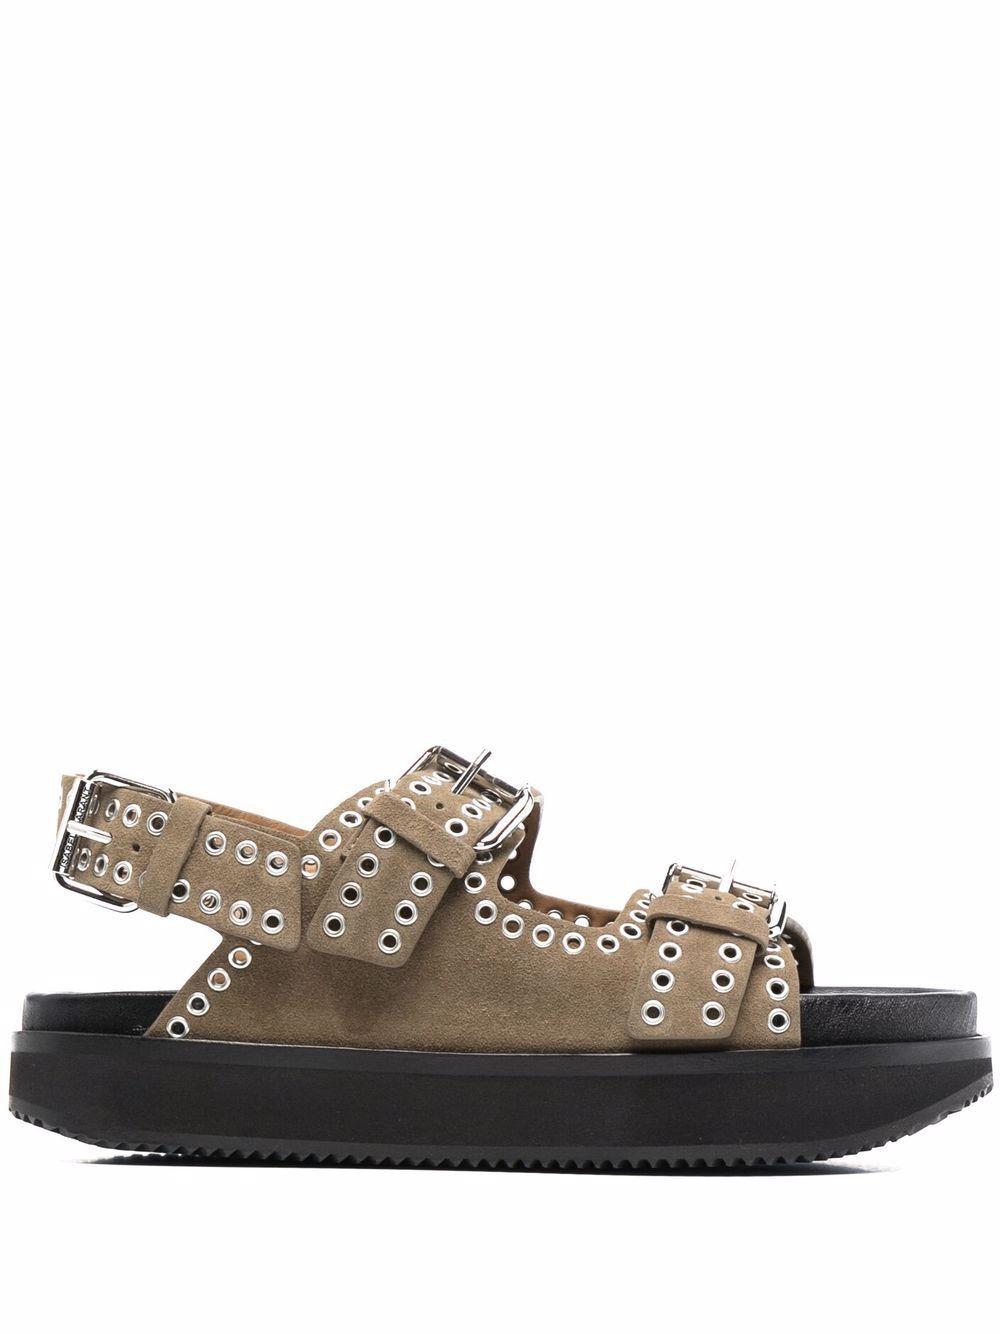 Sandalo ophie